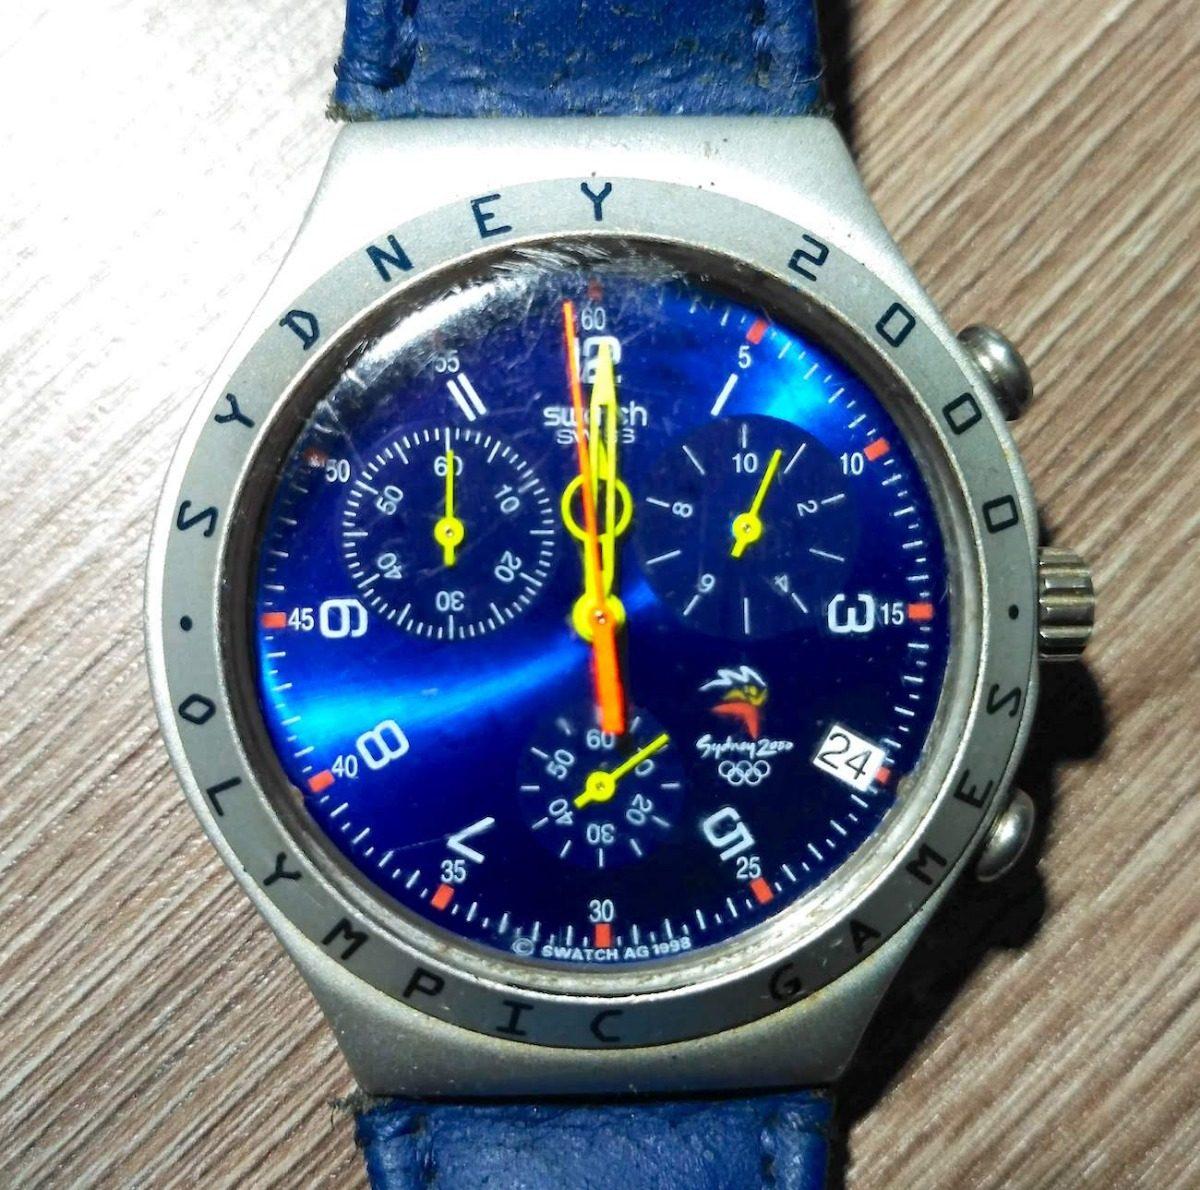 95f188baa9e relógio original swatch olimpíada sidney 2000 azul. Carregando zoom.